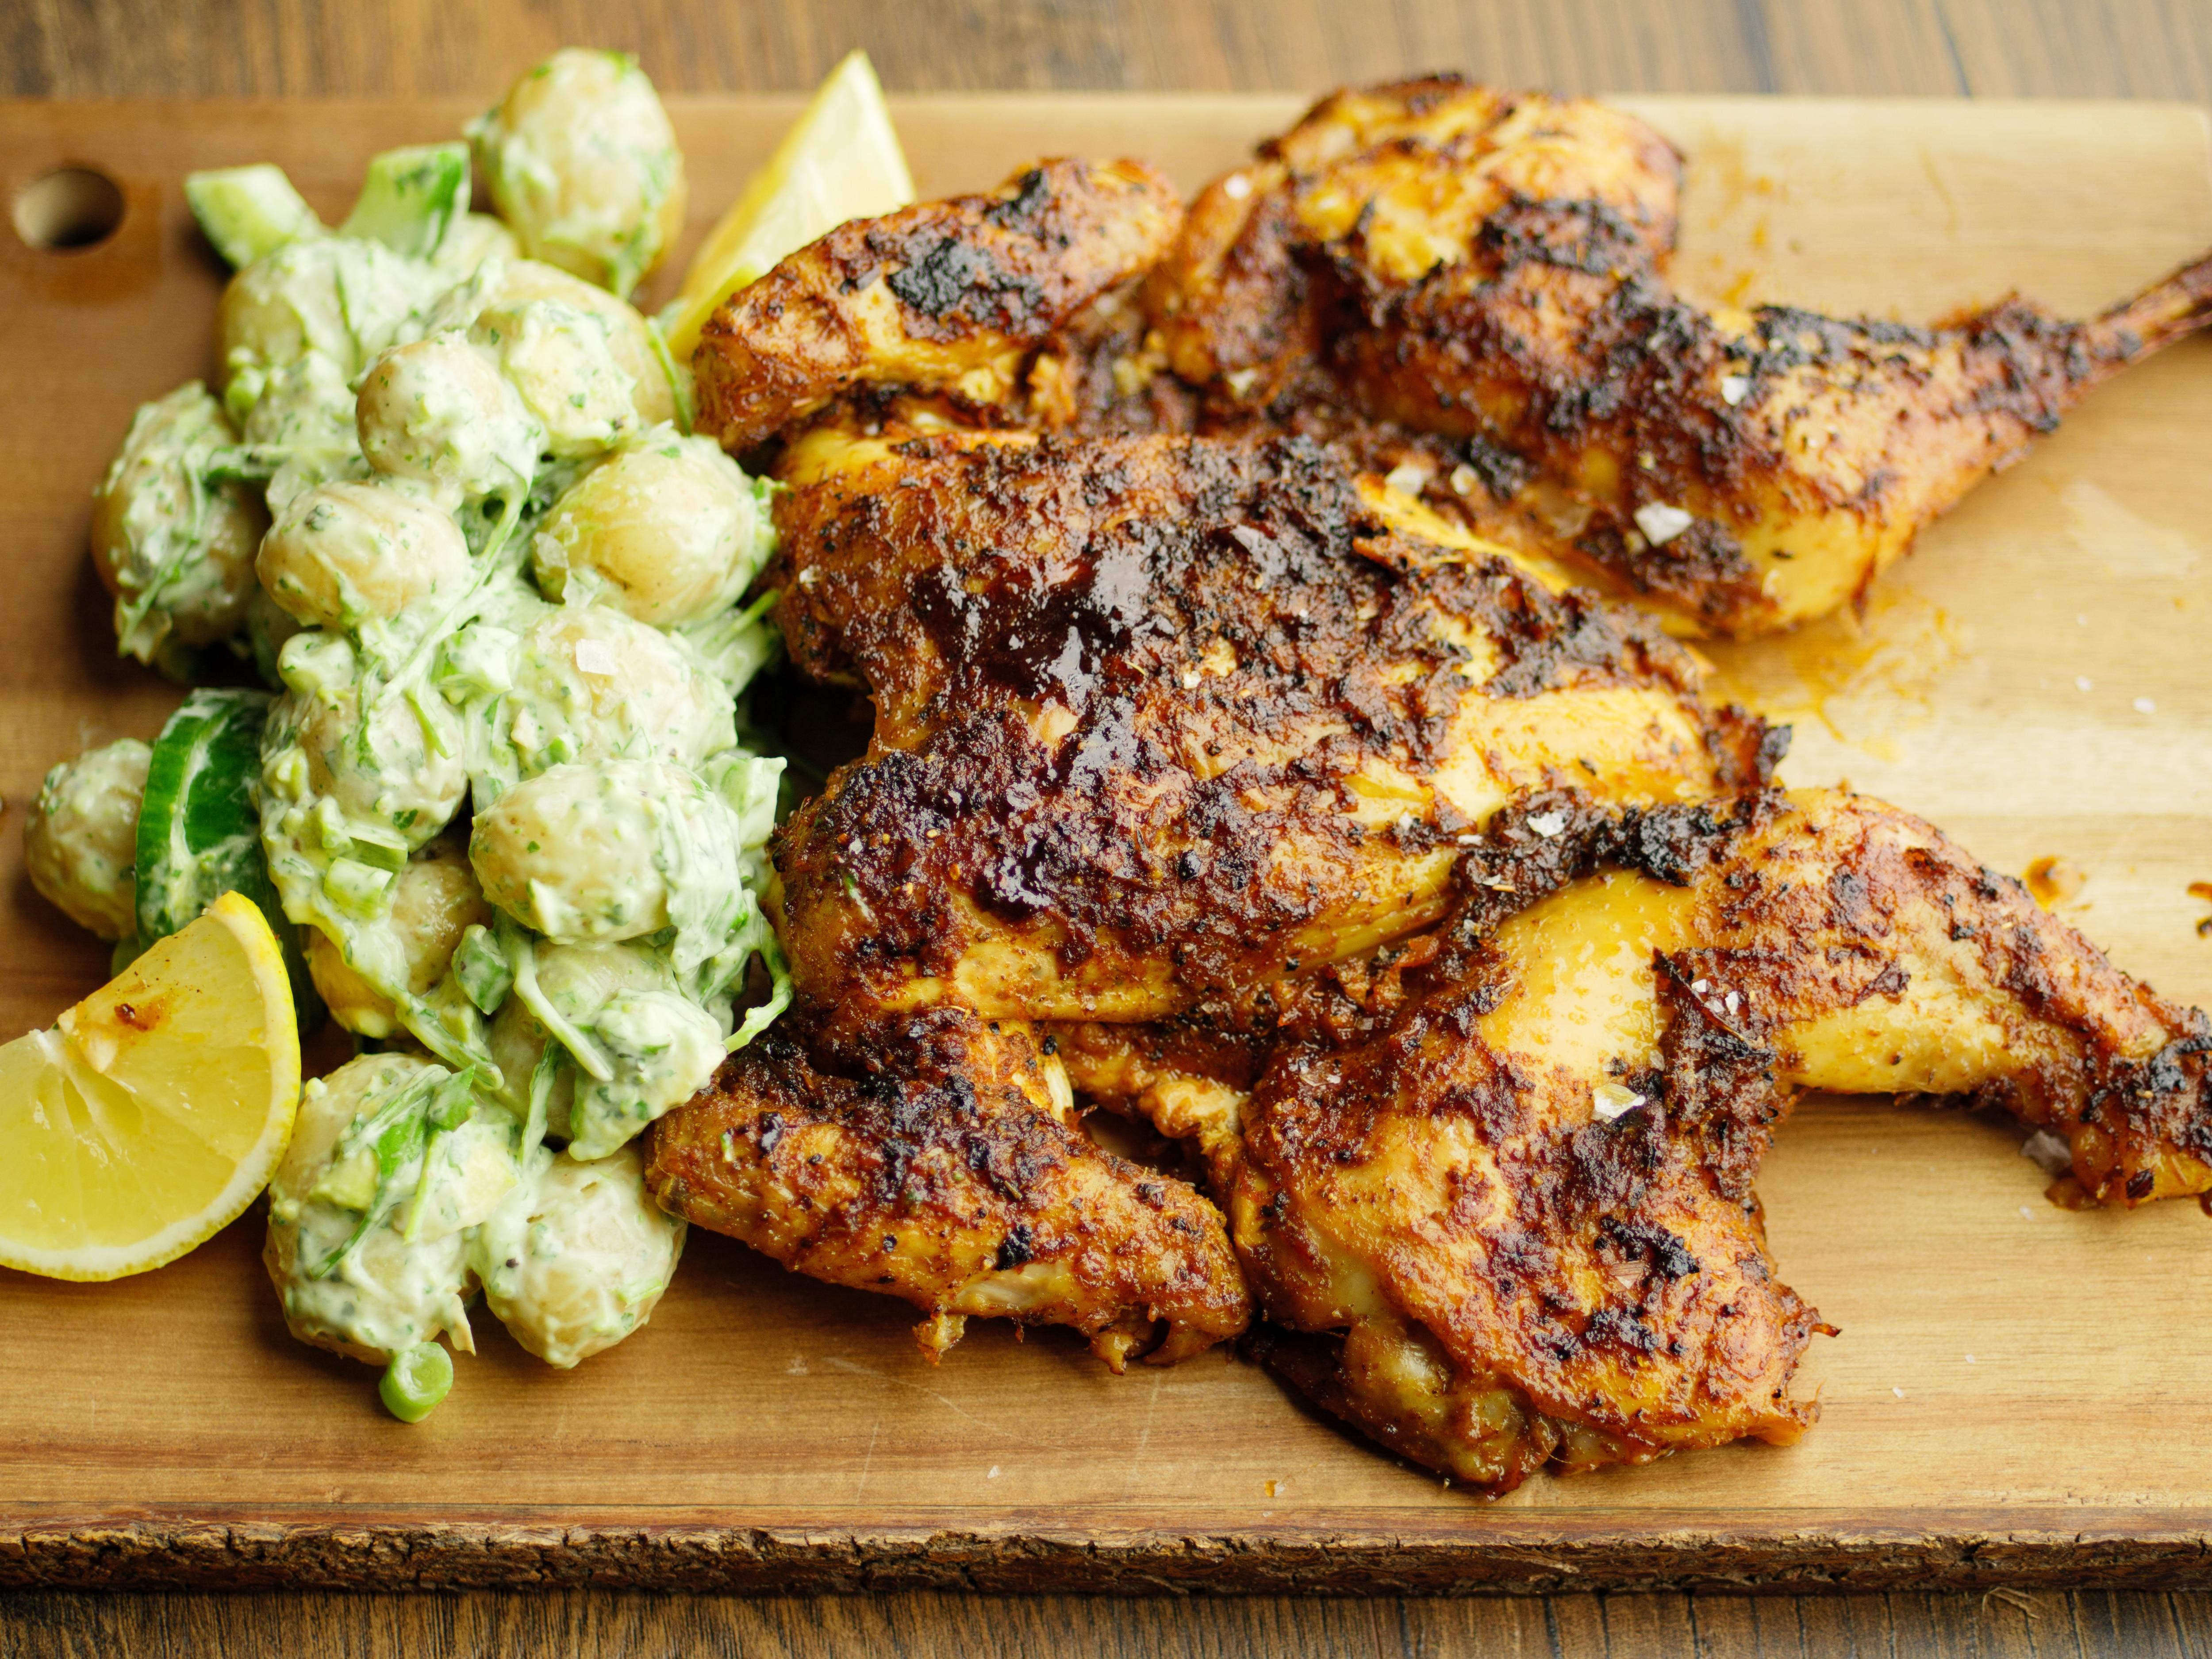 Peruvian Roast Chicken With Green Mayo